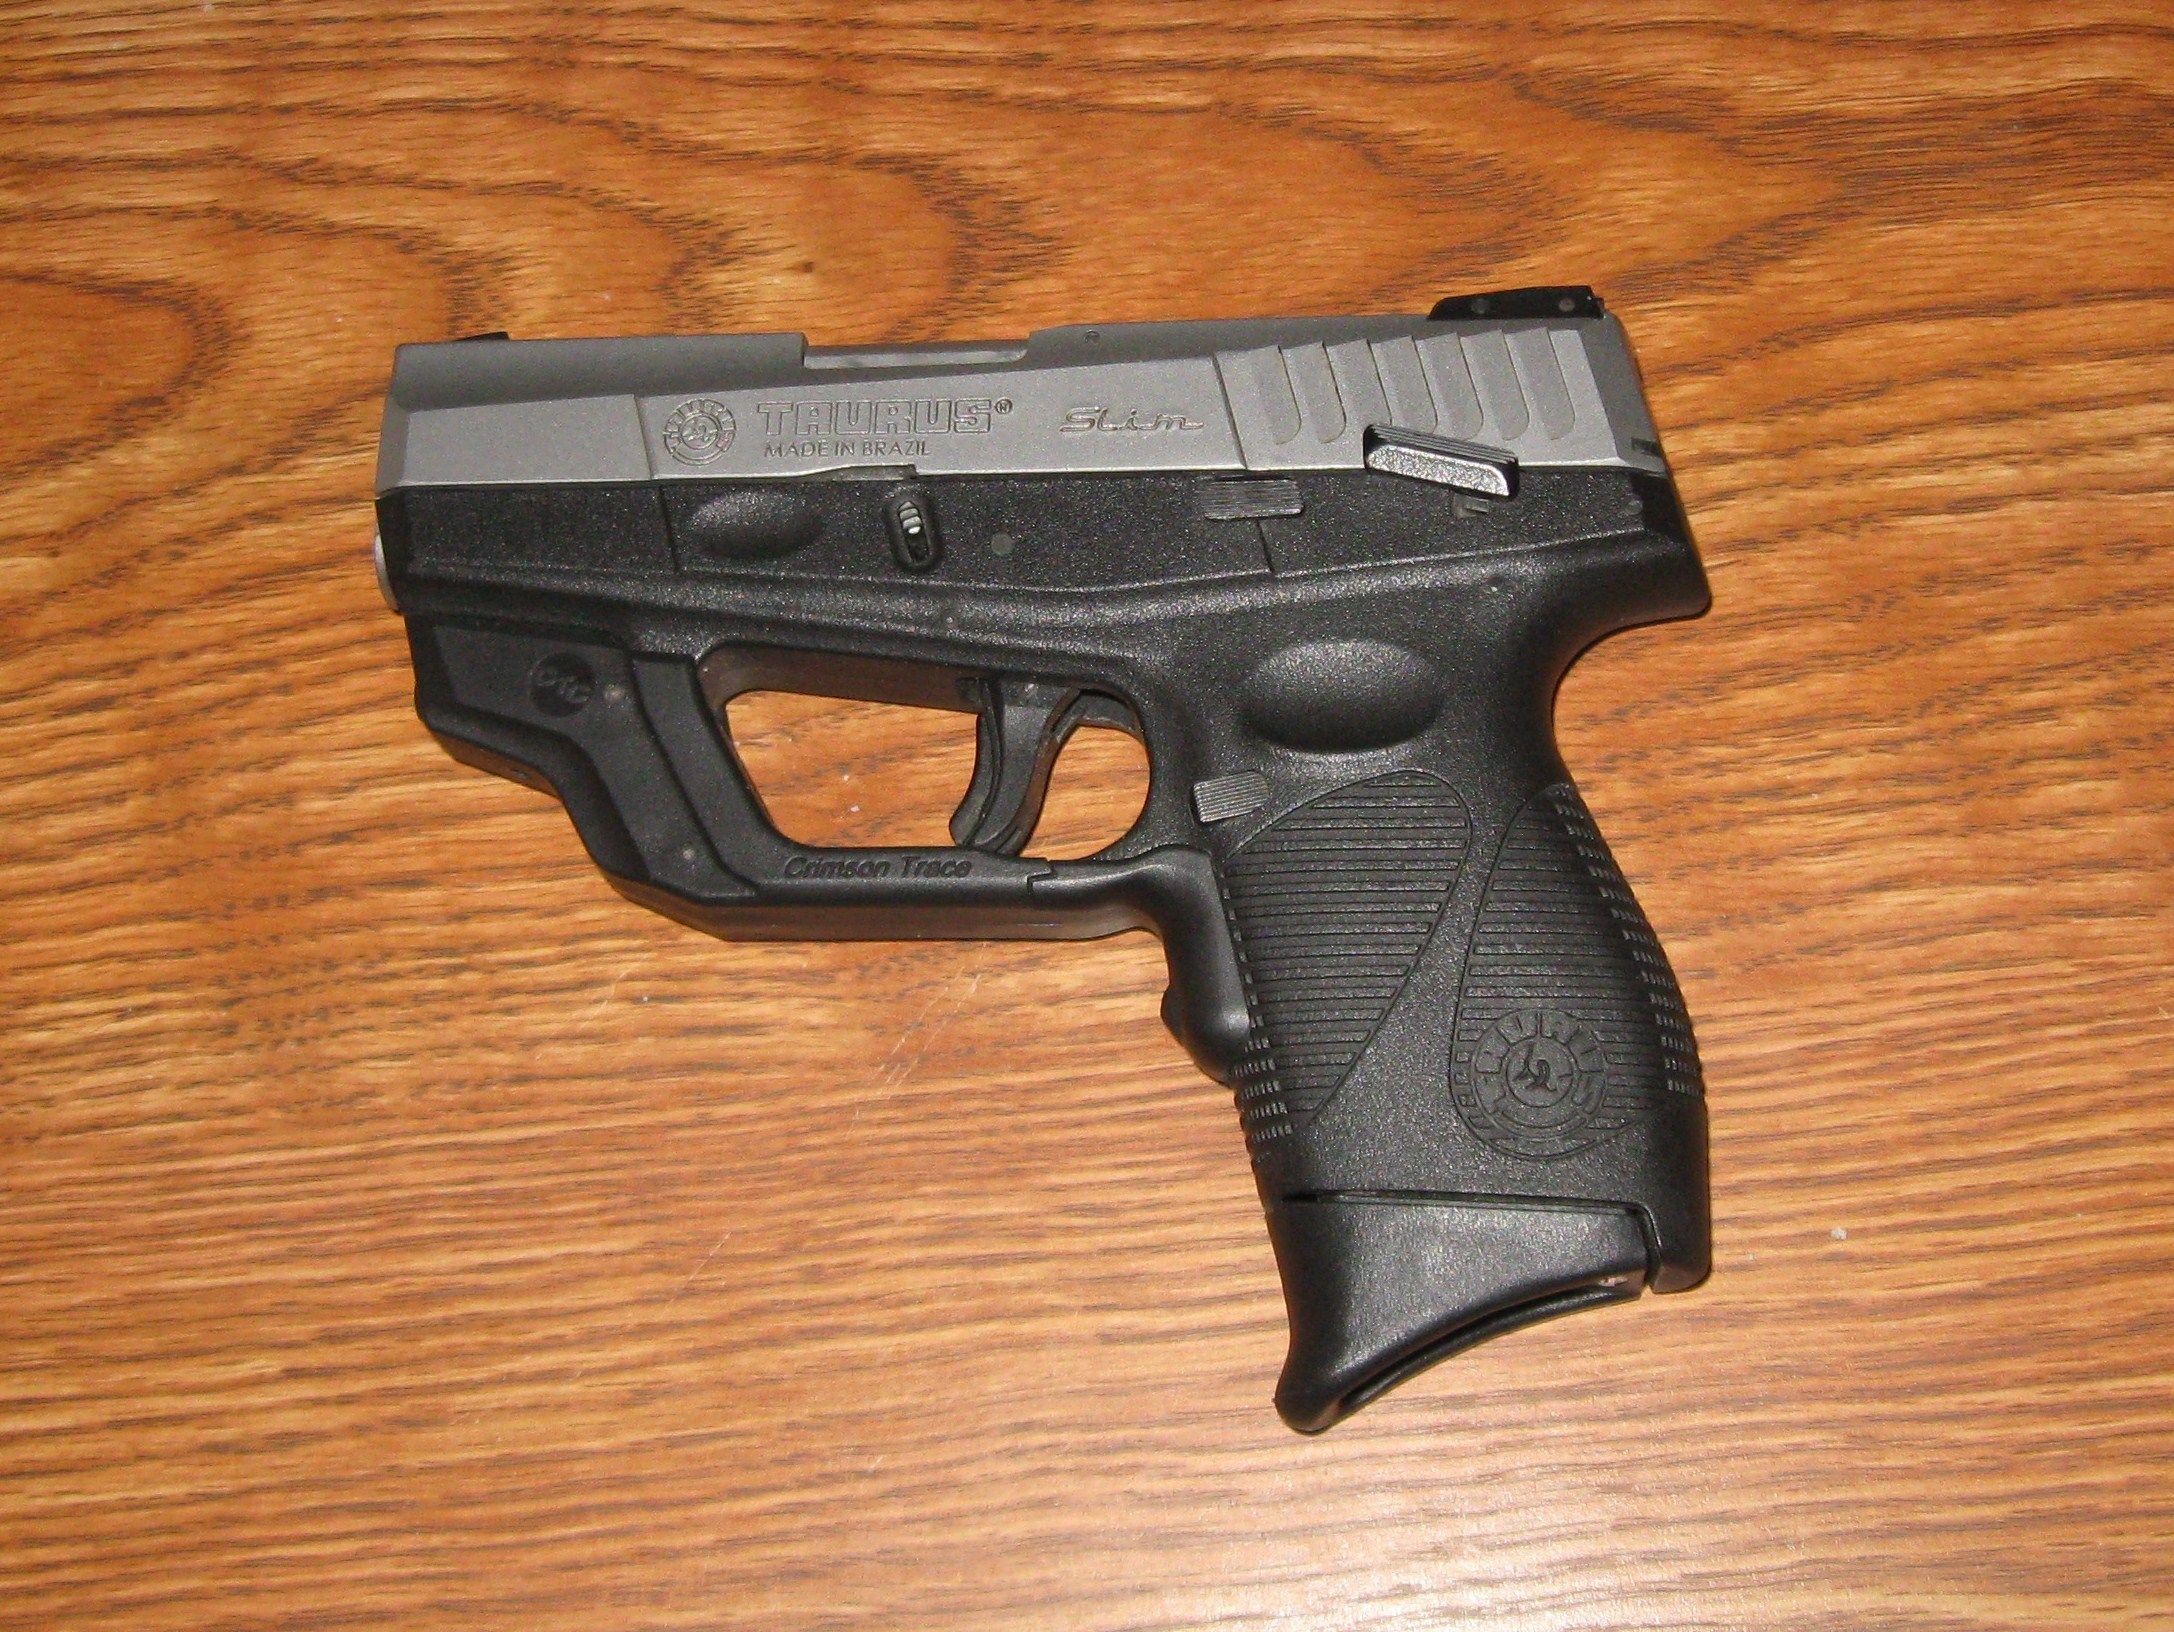 709 slim 9mm pistol - Taurus 709 Slim 9mm 75 In Wide